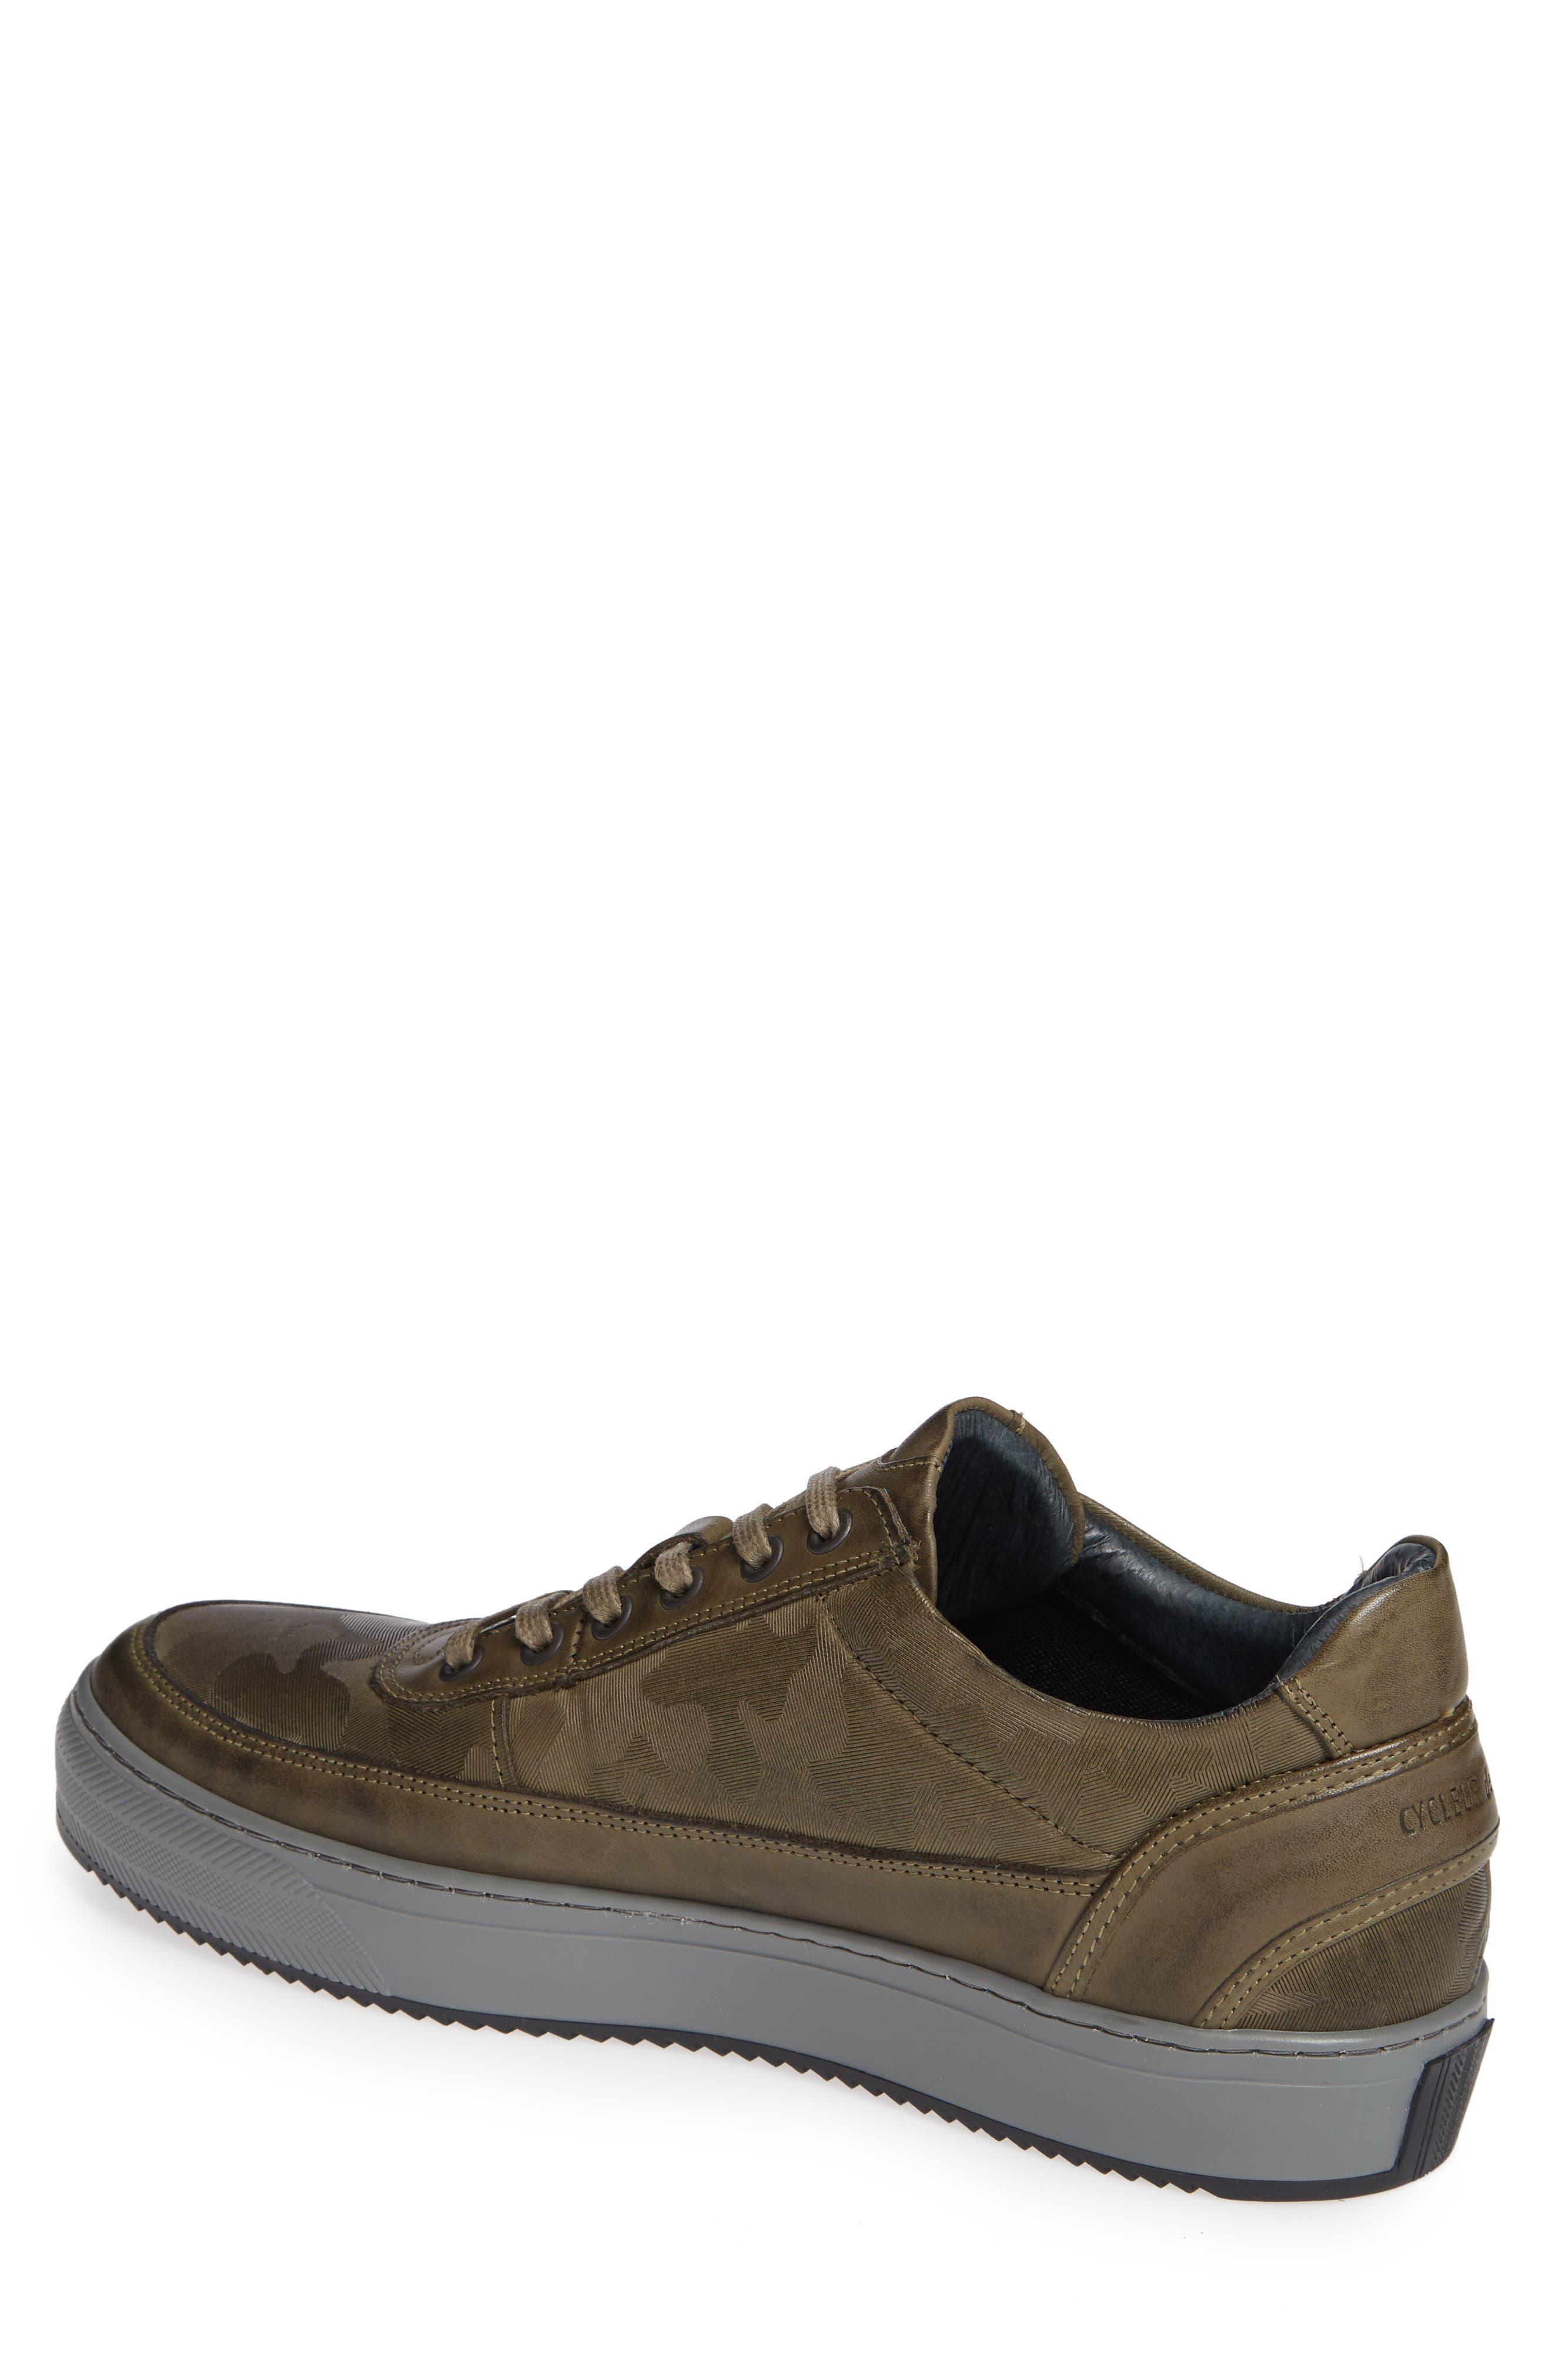 Montreal Sneaker,                             Alternate thumbnail 2, color,                             MILITARY GREEN